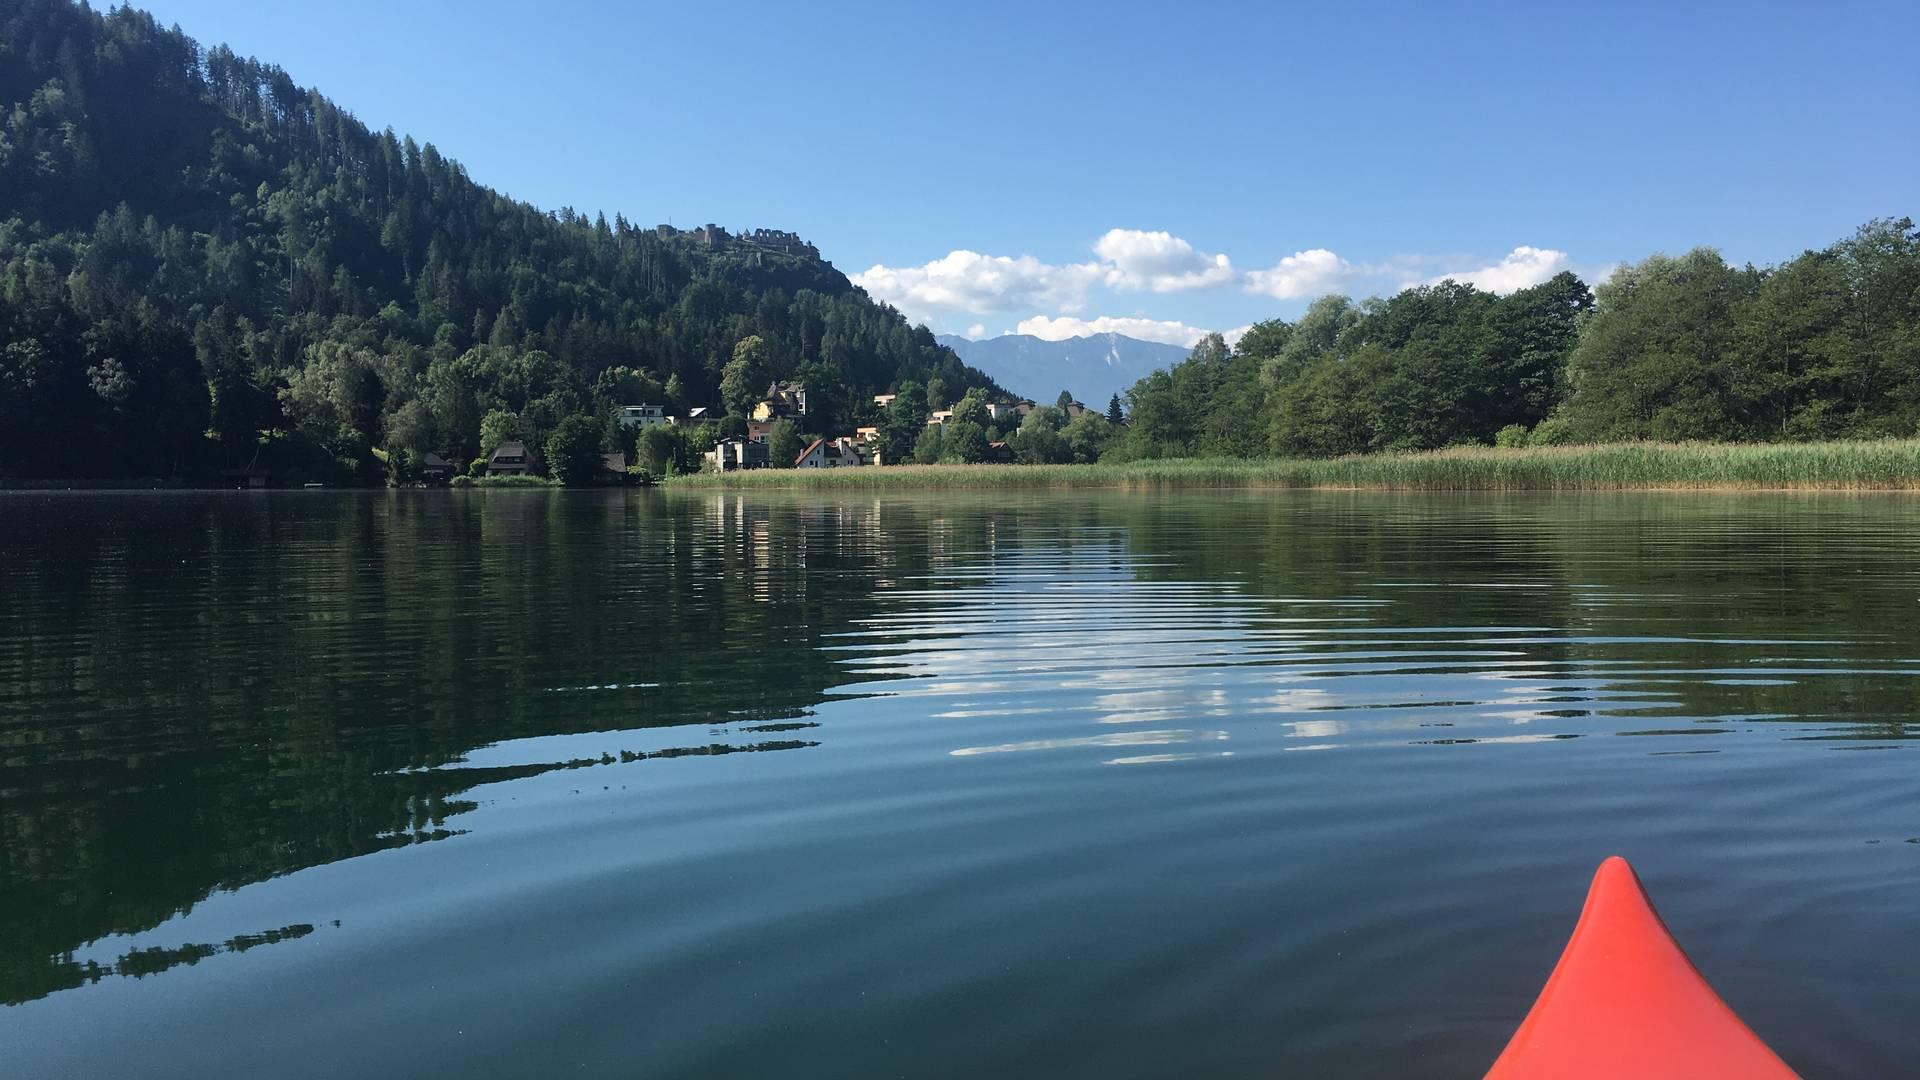 <p>Urlaub im Wohnmobil von Ute Zaworka, Kajaktour am Ossiacher See</p>